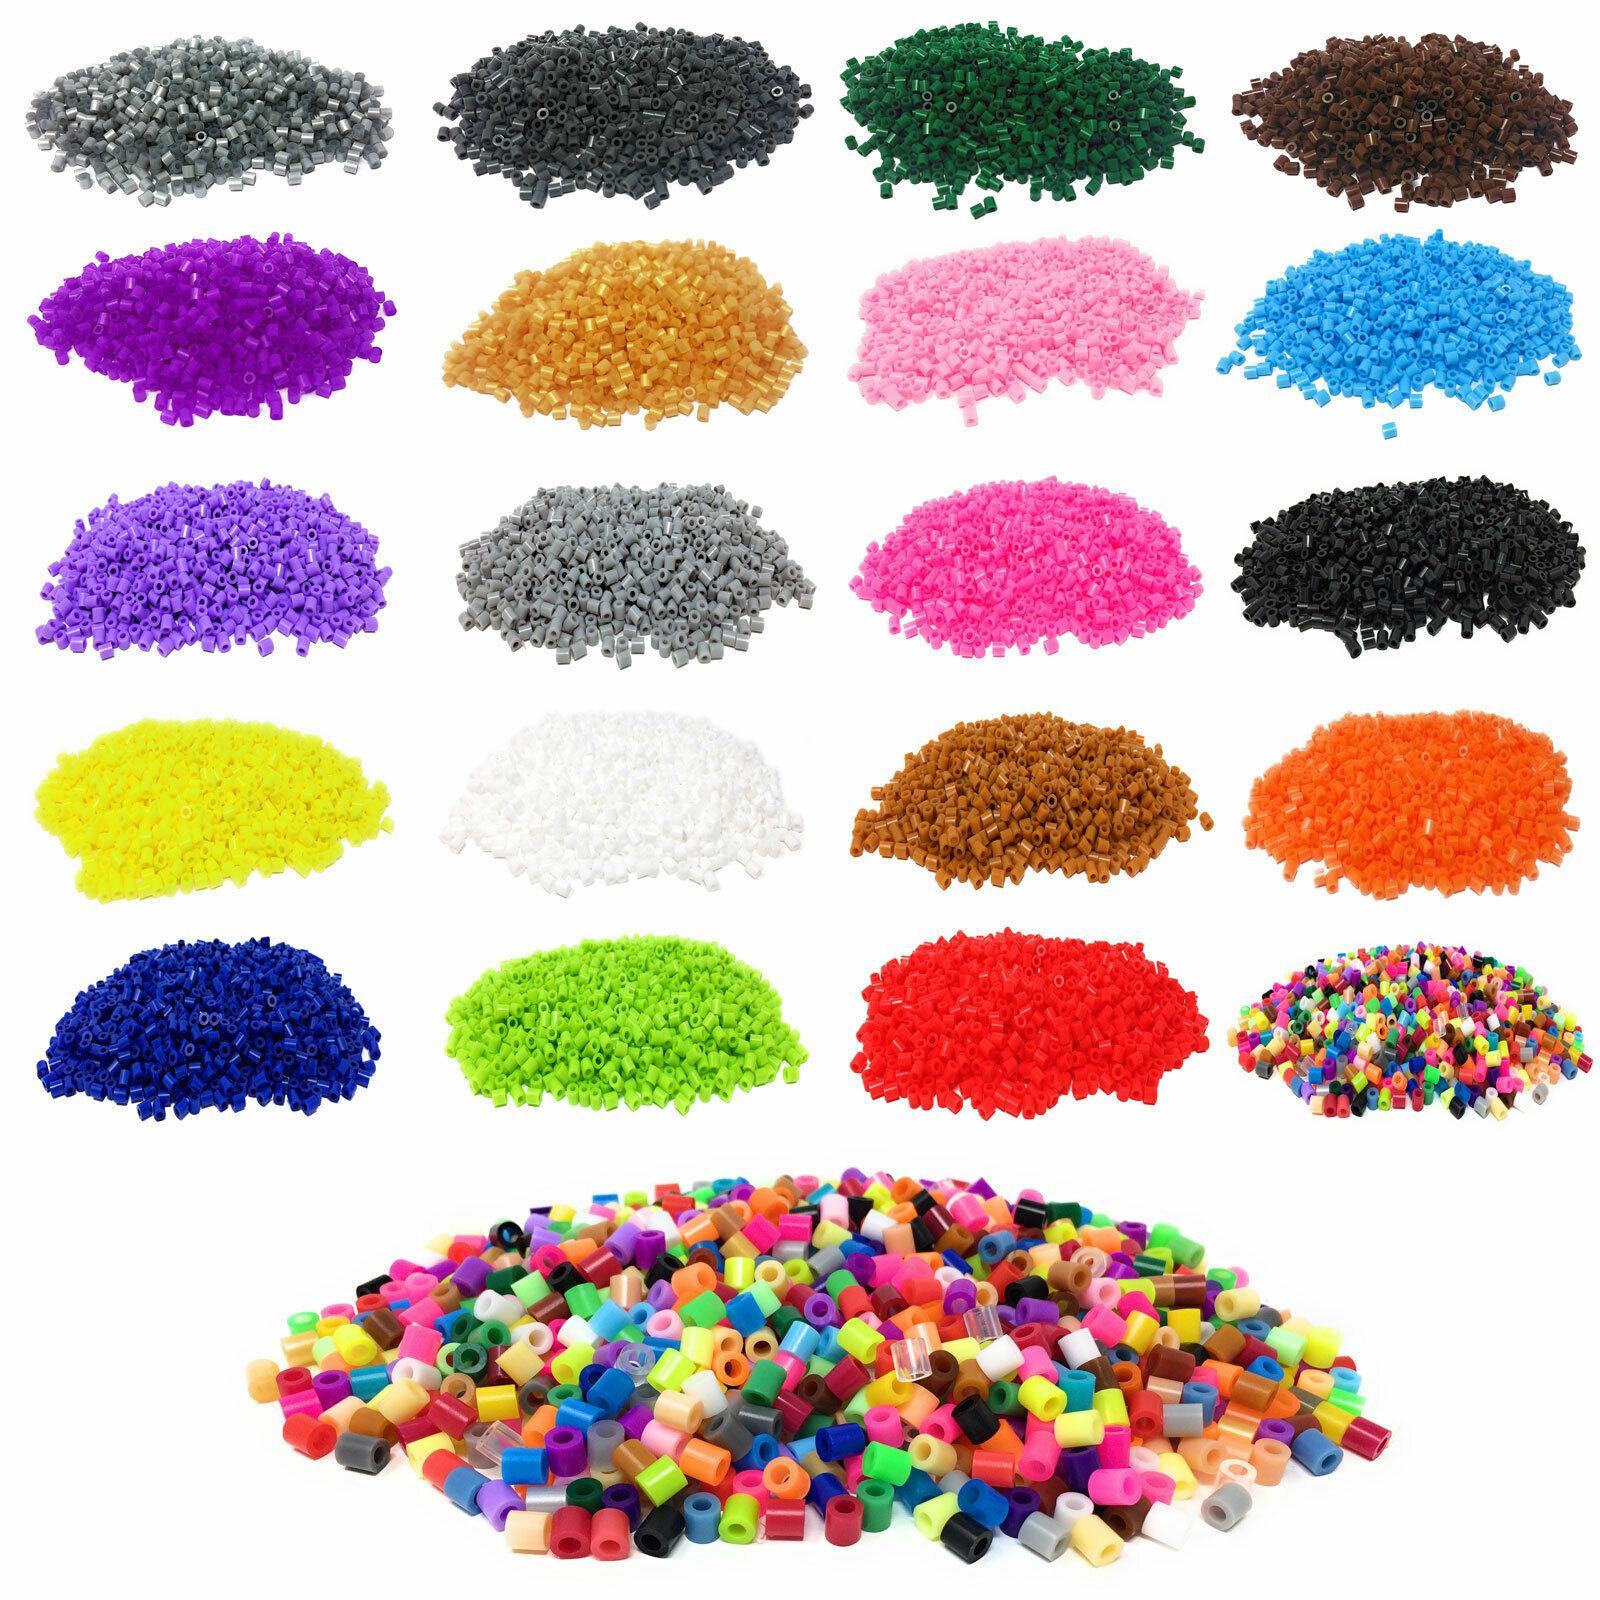 Fuse Beads 1000 Pack Hama Beads 5mm Midi Work Like Hama Bead Mixed Iron Kids Arts & Crafts Educational Toys(China)